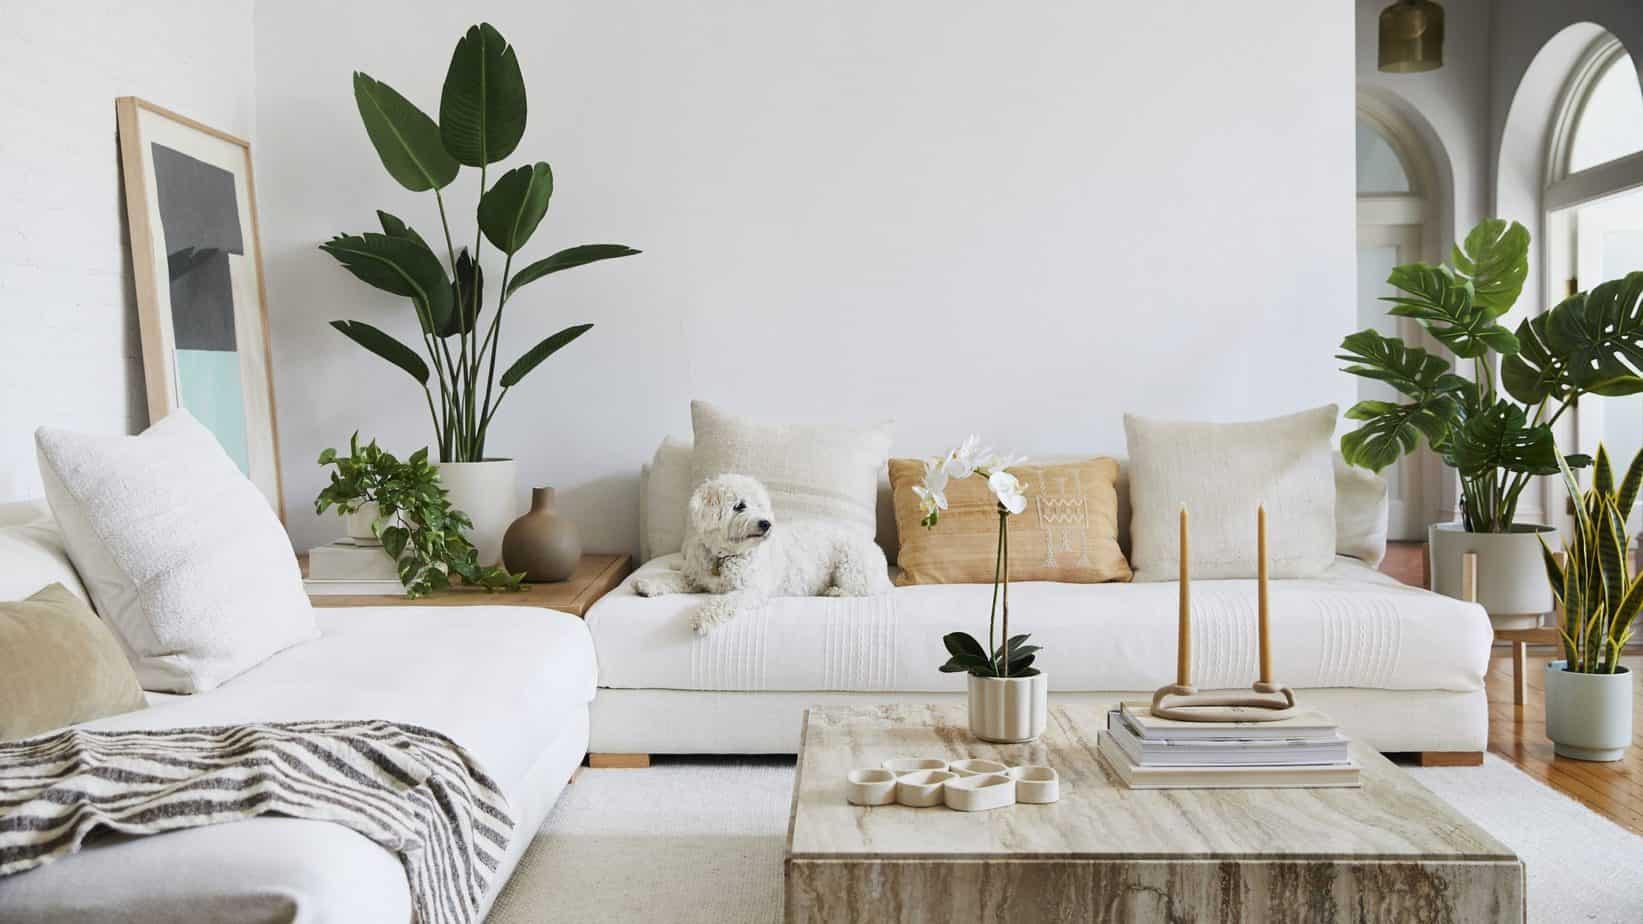 modern home design ideas 2021 greenery and houseplants